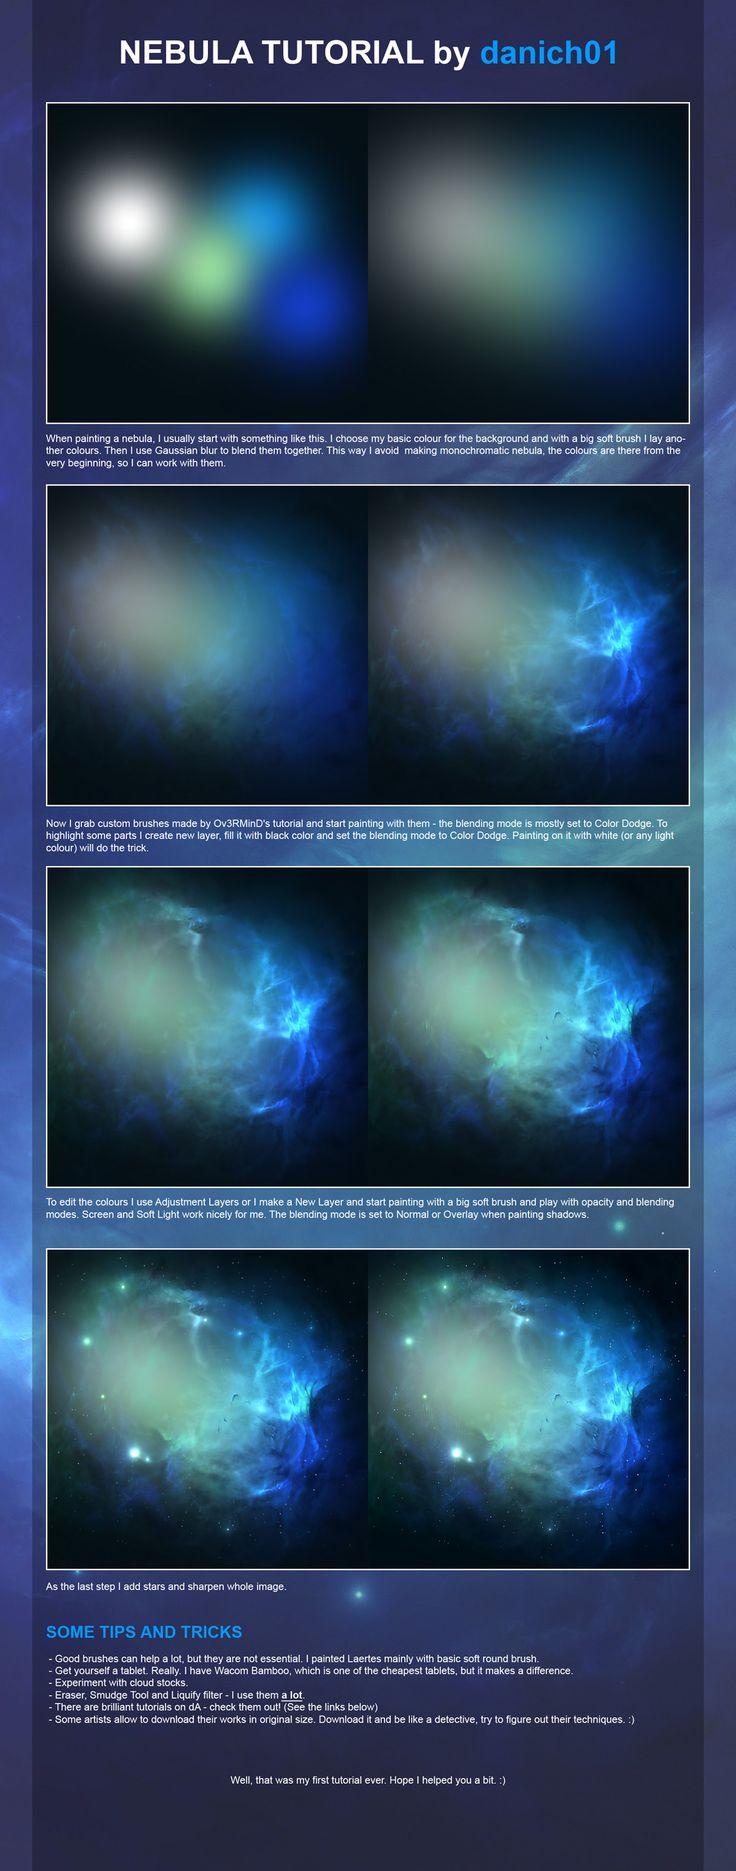 Nebula tutorial by danich01 on DeviantArt